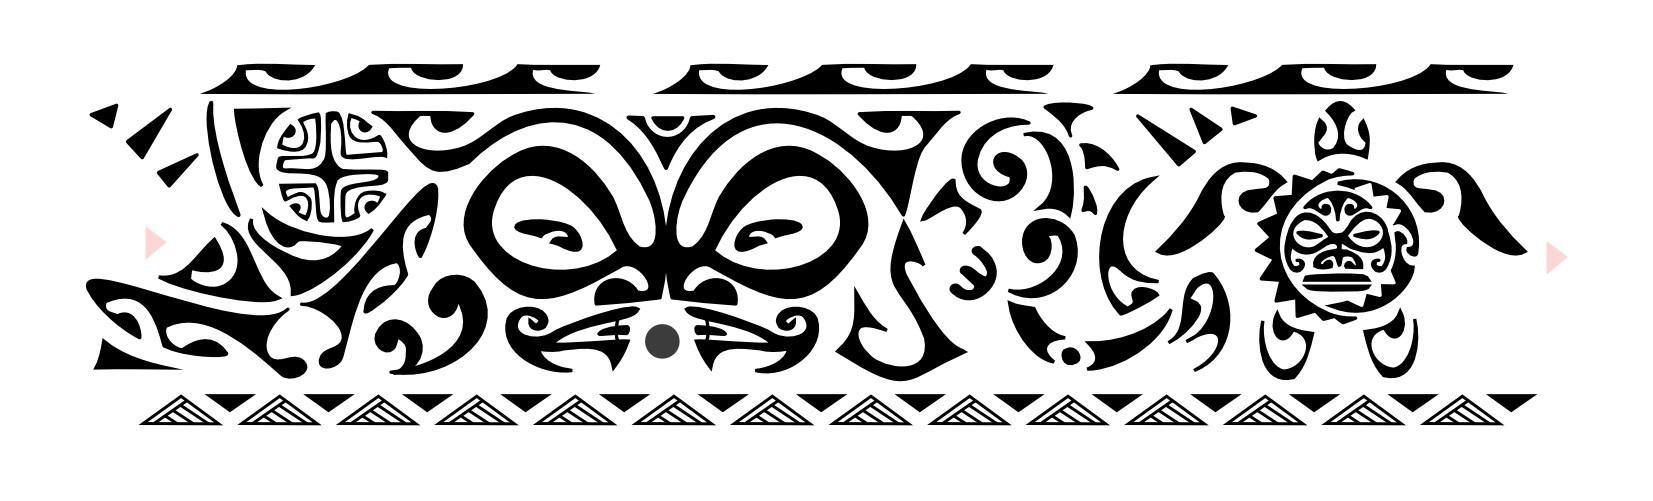 Maori Armband Forearmband Browse Images About Forearmband At